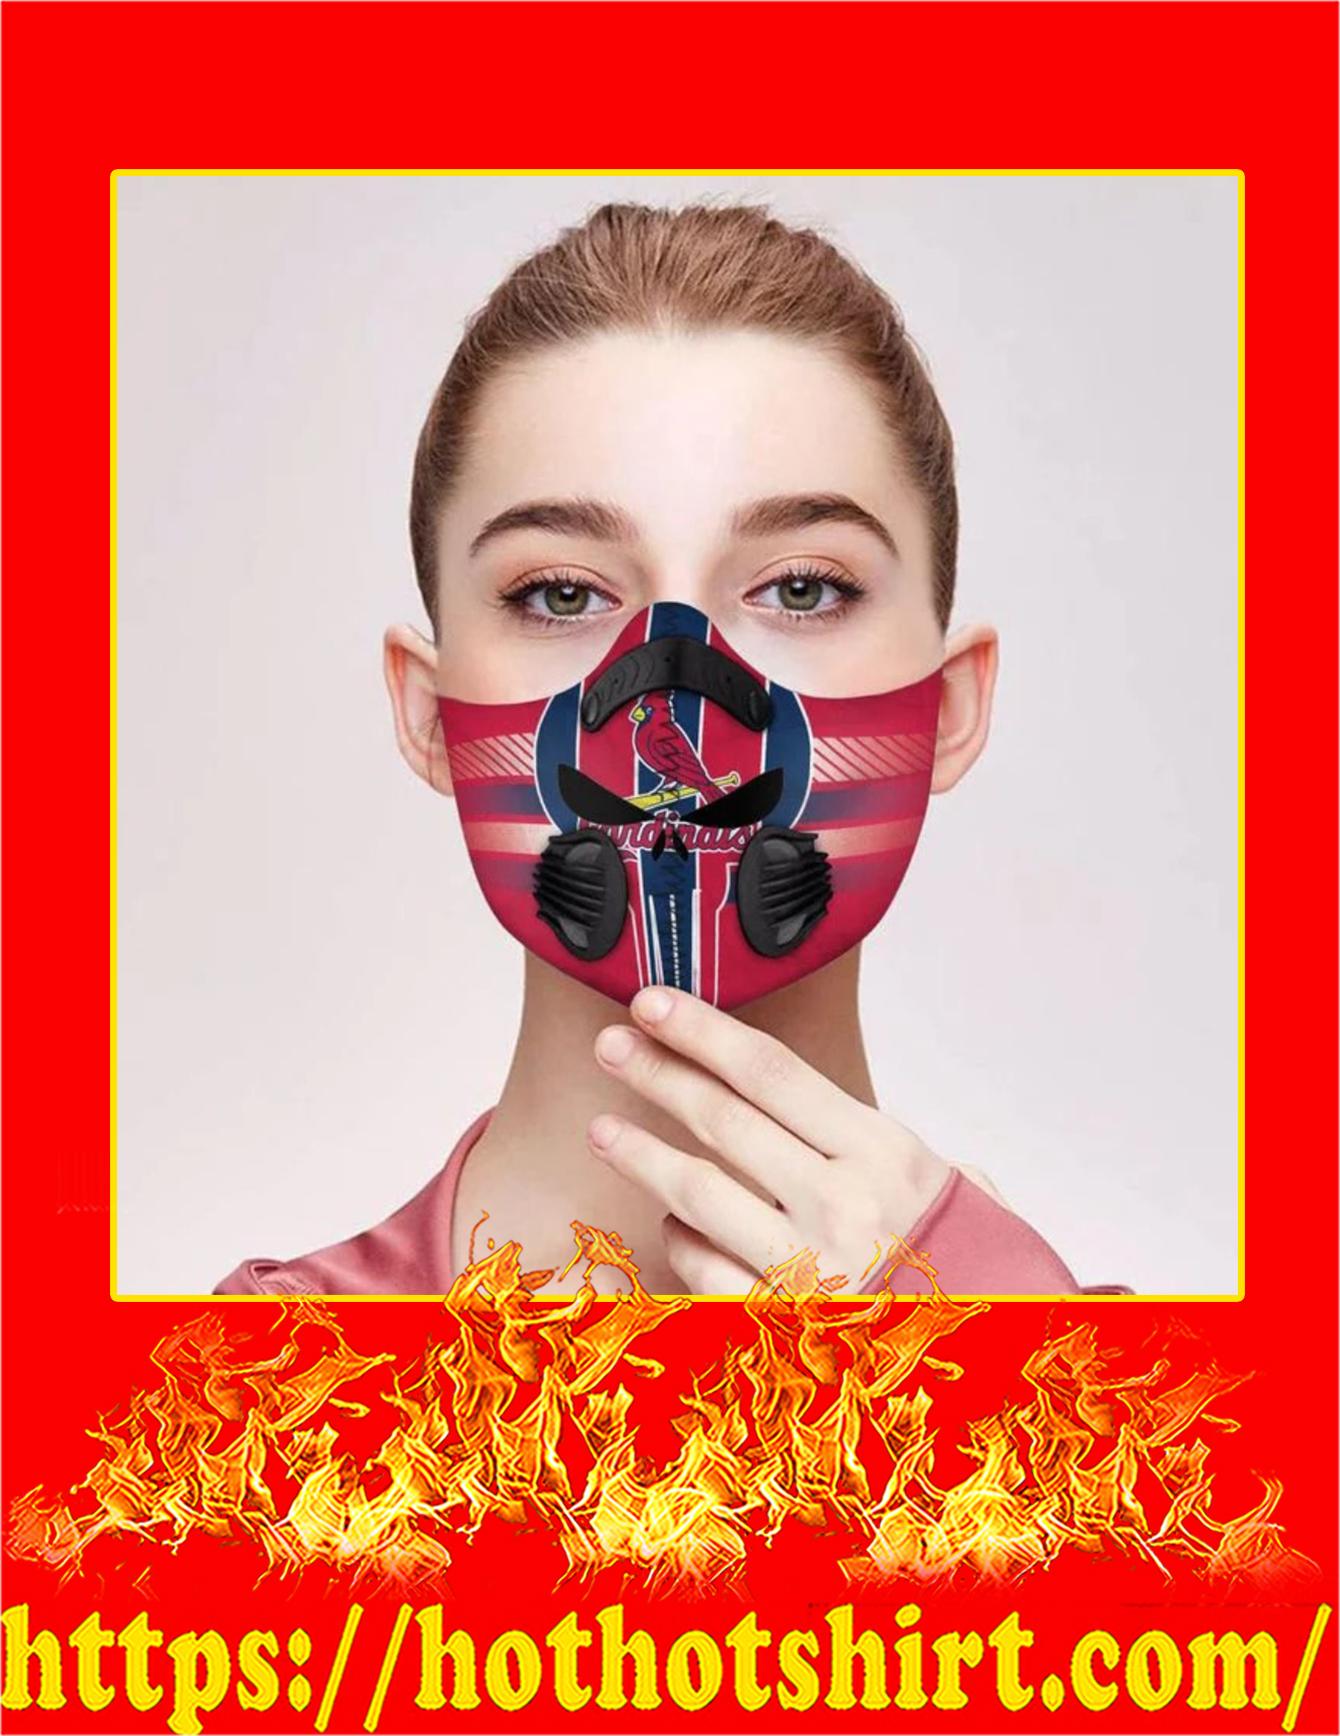 Cardinals punisher skull filter face mask - Pic 1